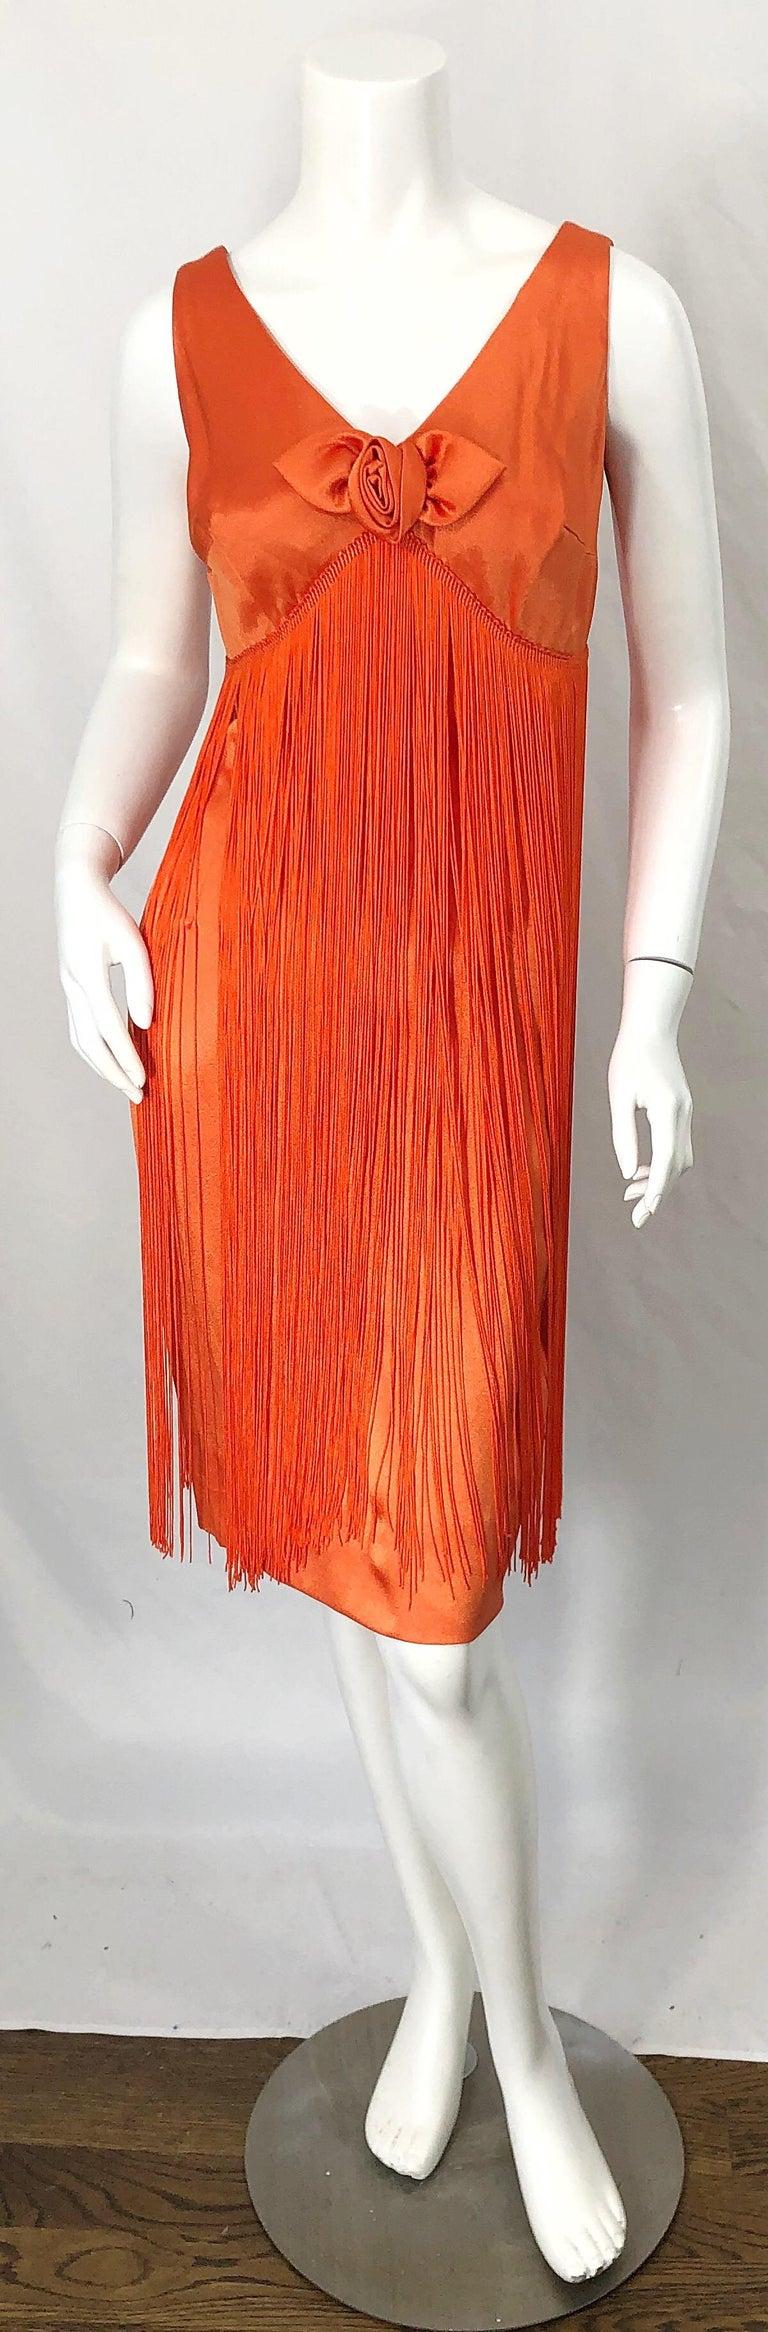 1960s Joseph Magnin Neon Orange Fully Fringed Vintage 60s Flapper Dress For Sale 8